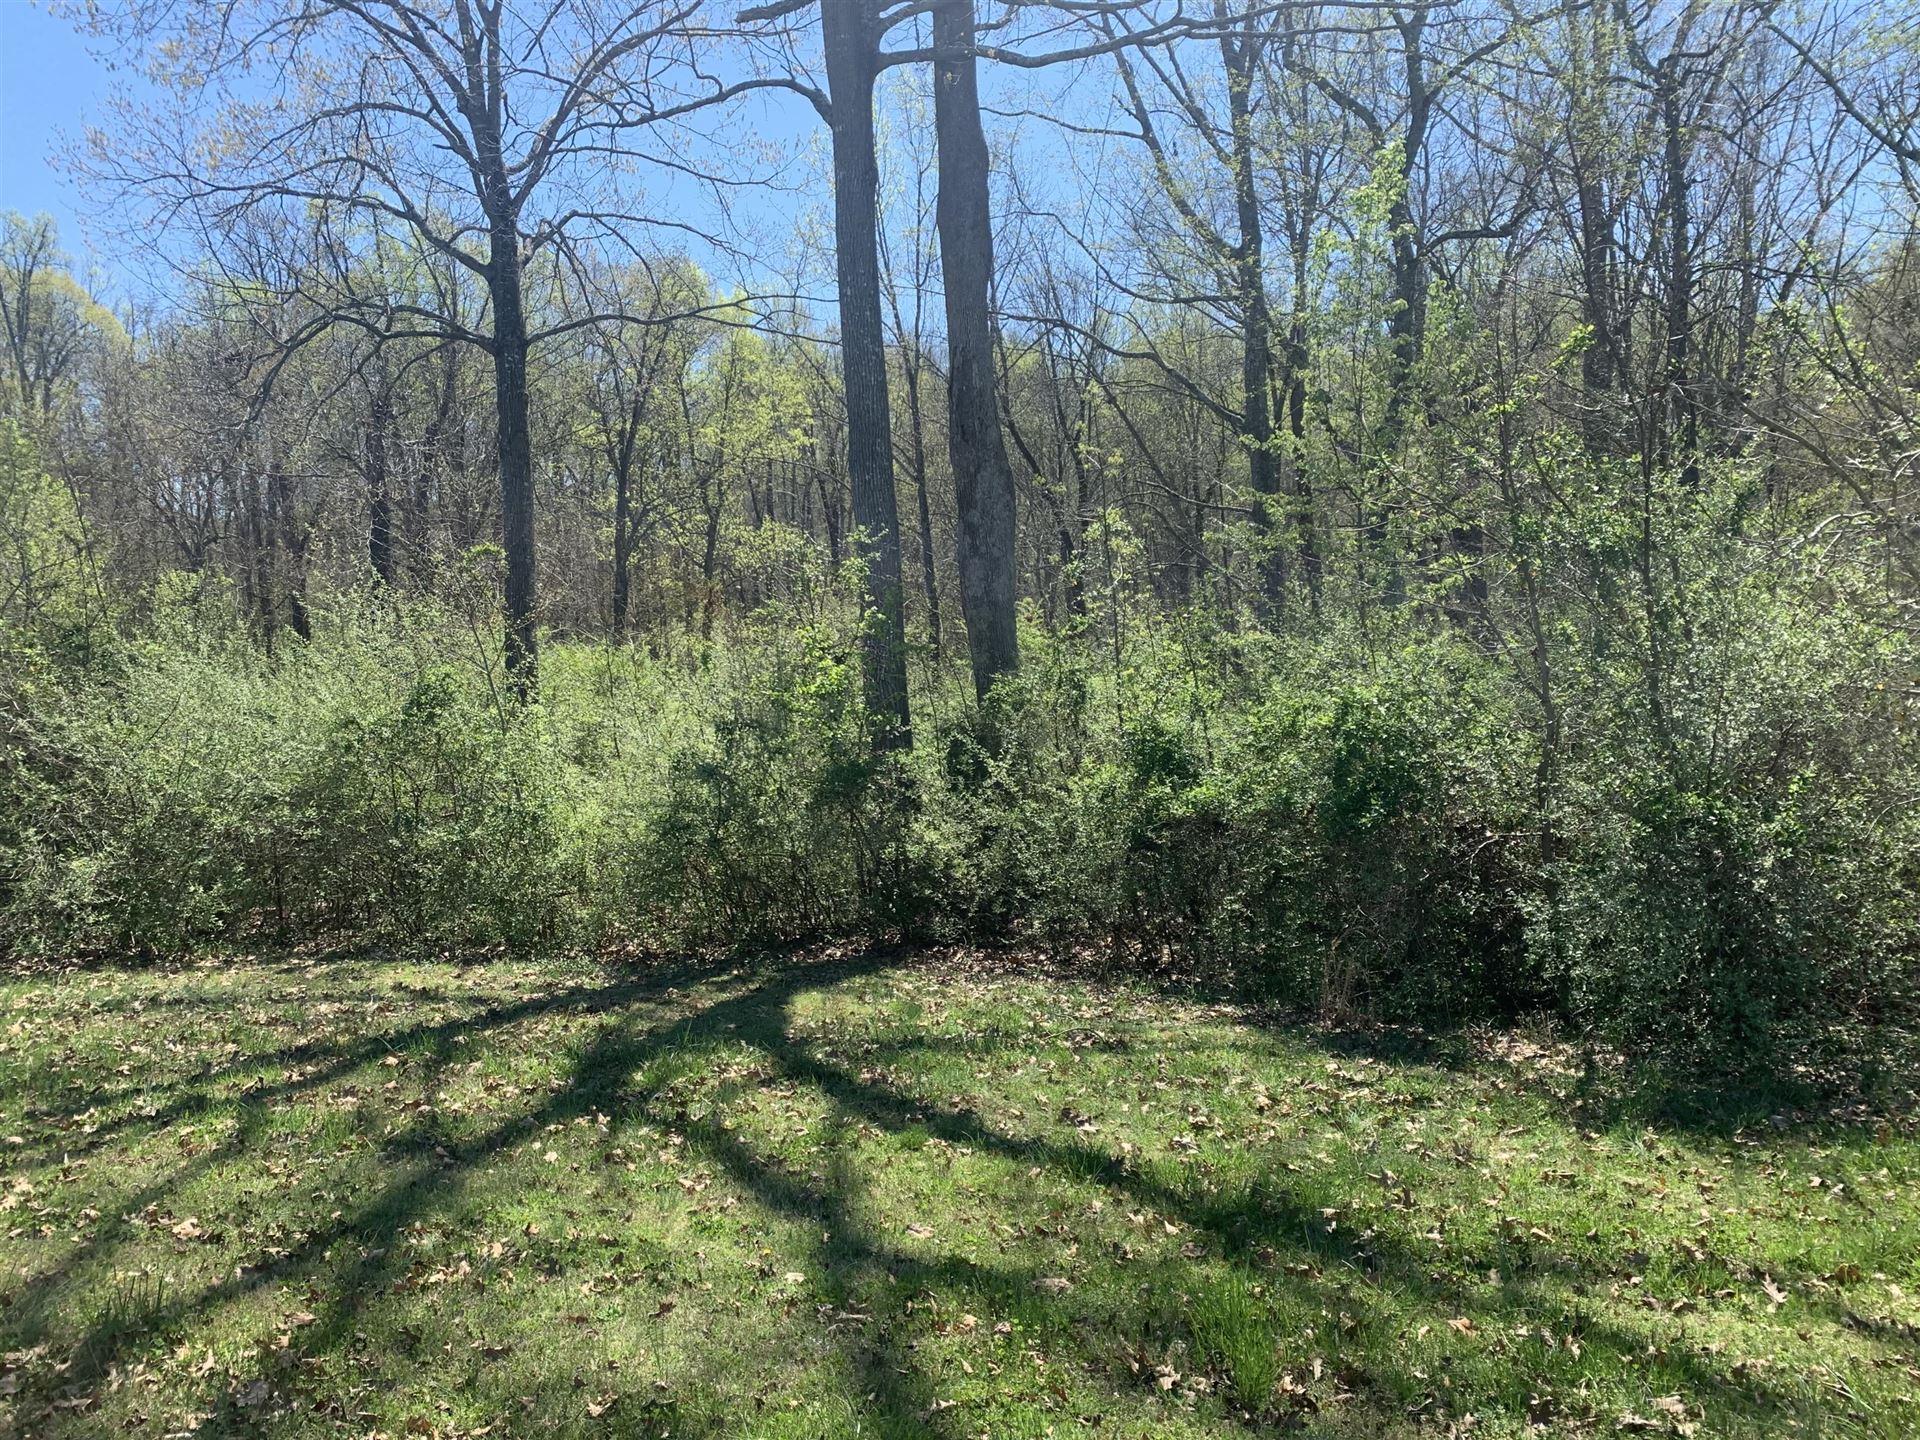 Photo of Lot 9 Preserve at Lashbrooke, Louisville, TN 37777 (MLS # 1147503)